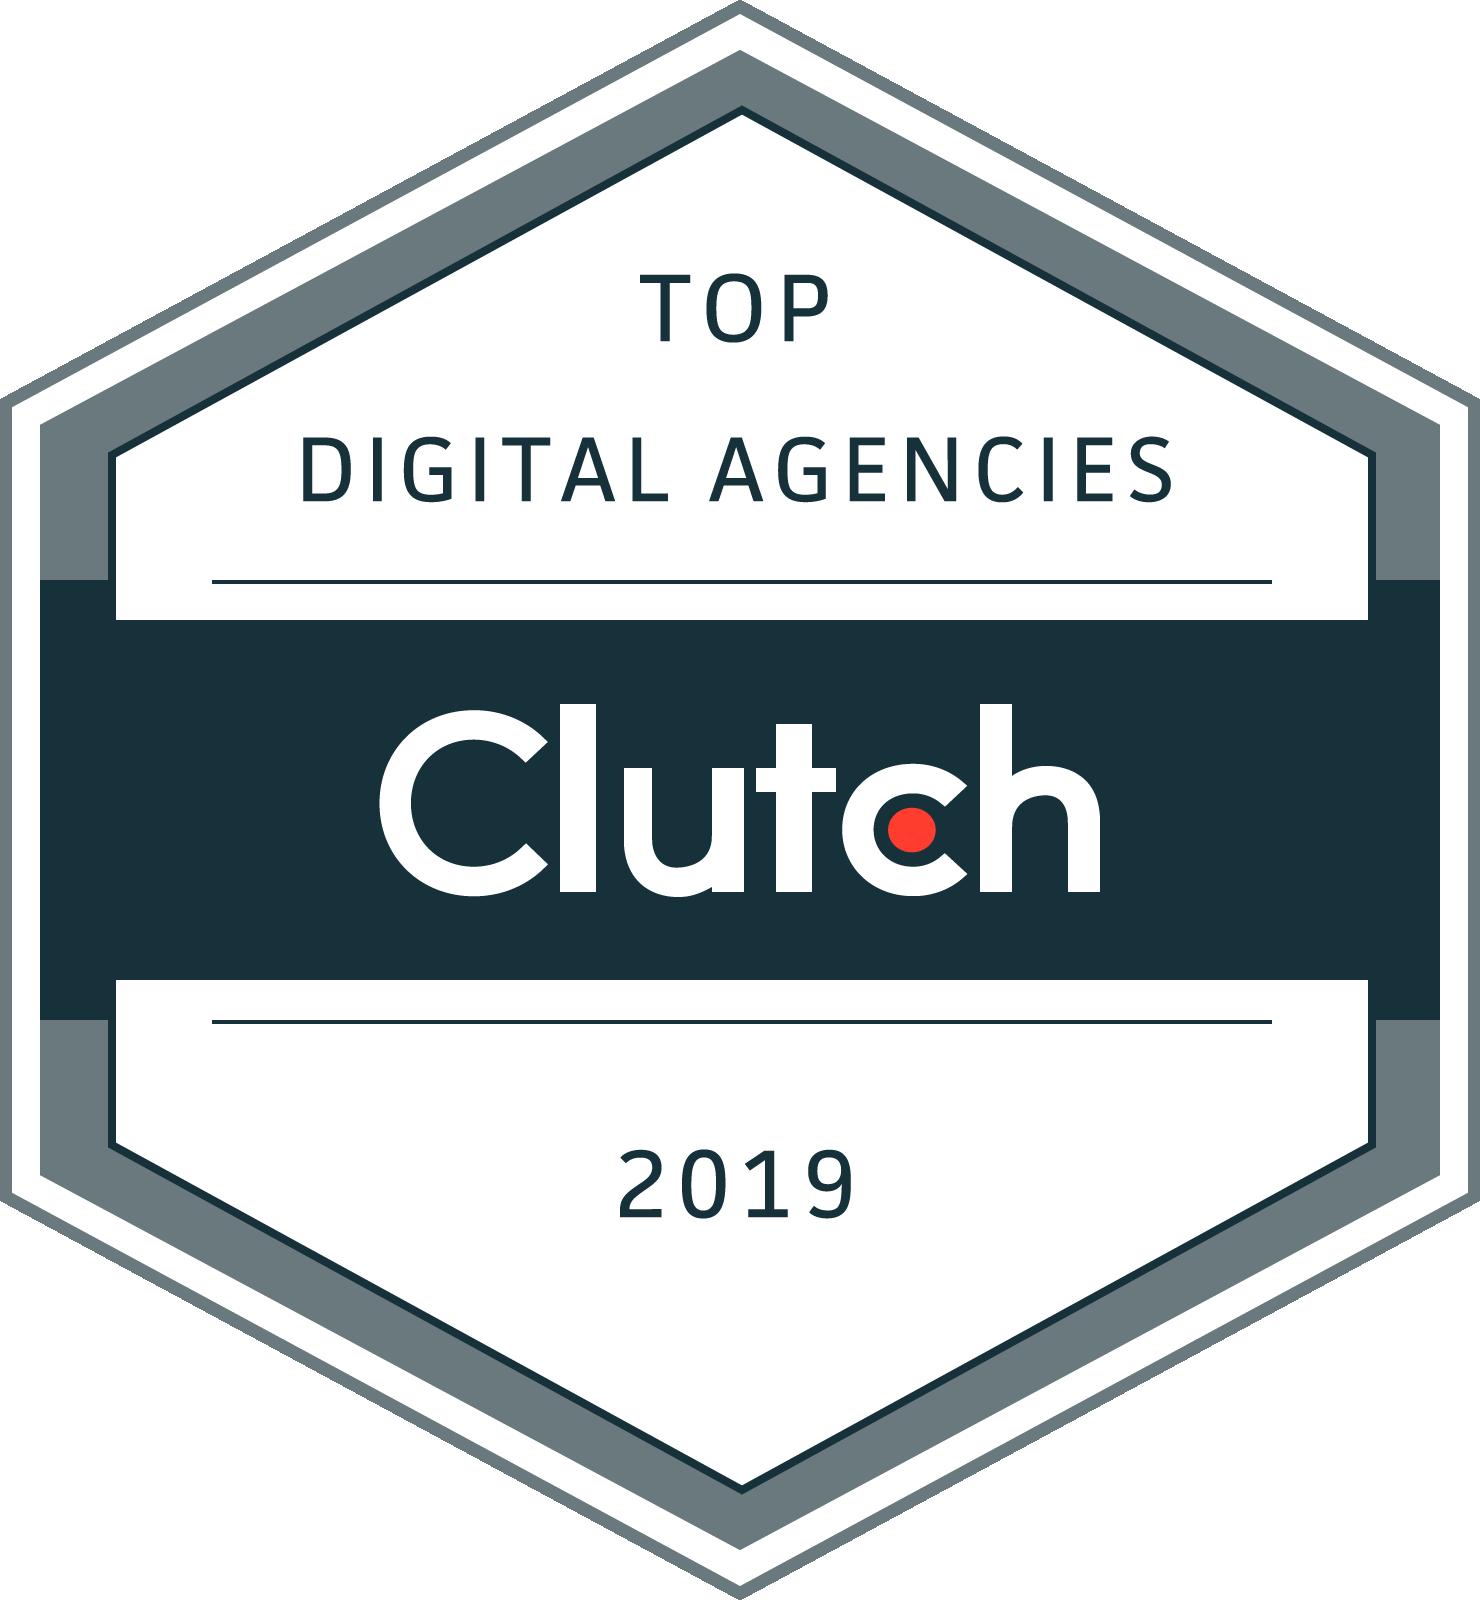 Top Digital Agency Award 2019